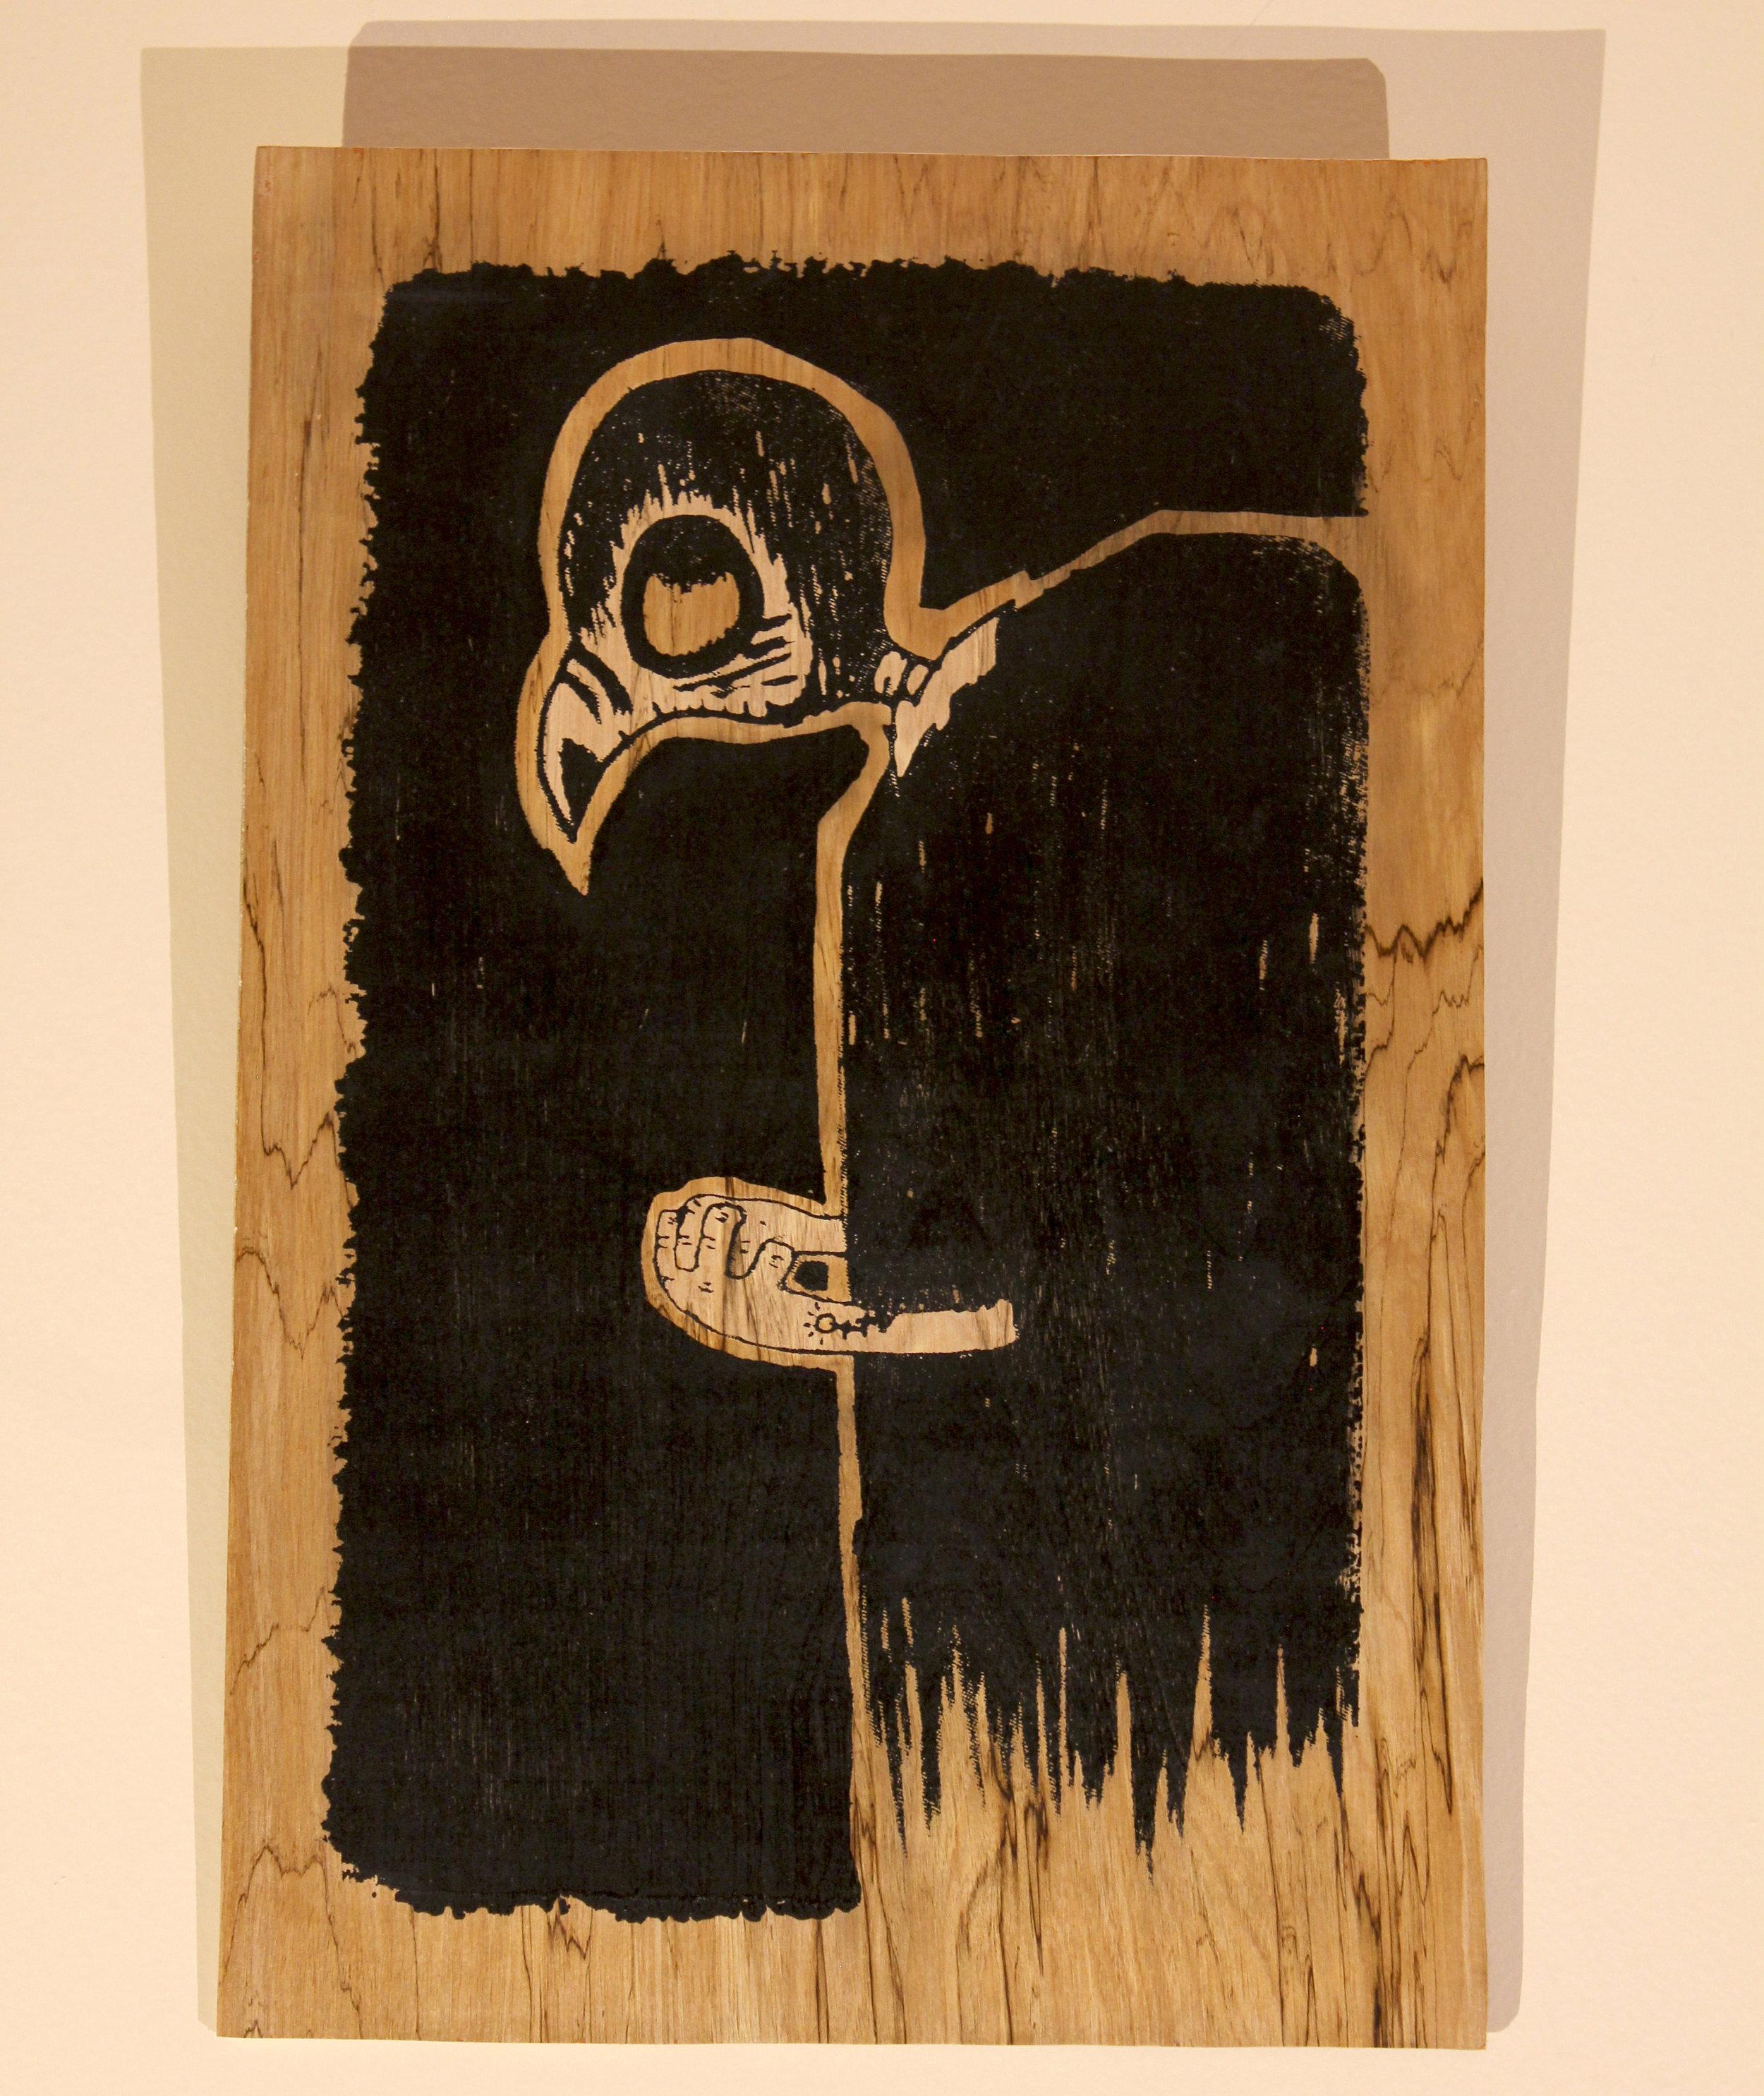 Birb Lord #1   $100 birch panel, acrylic ink, wood seal